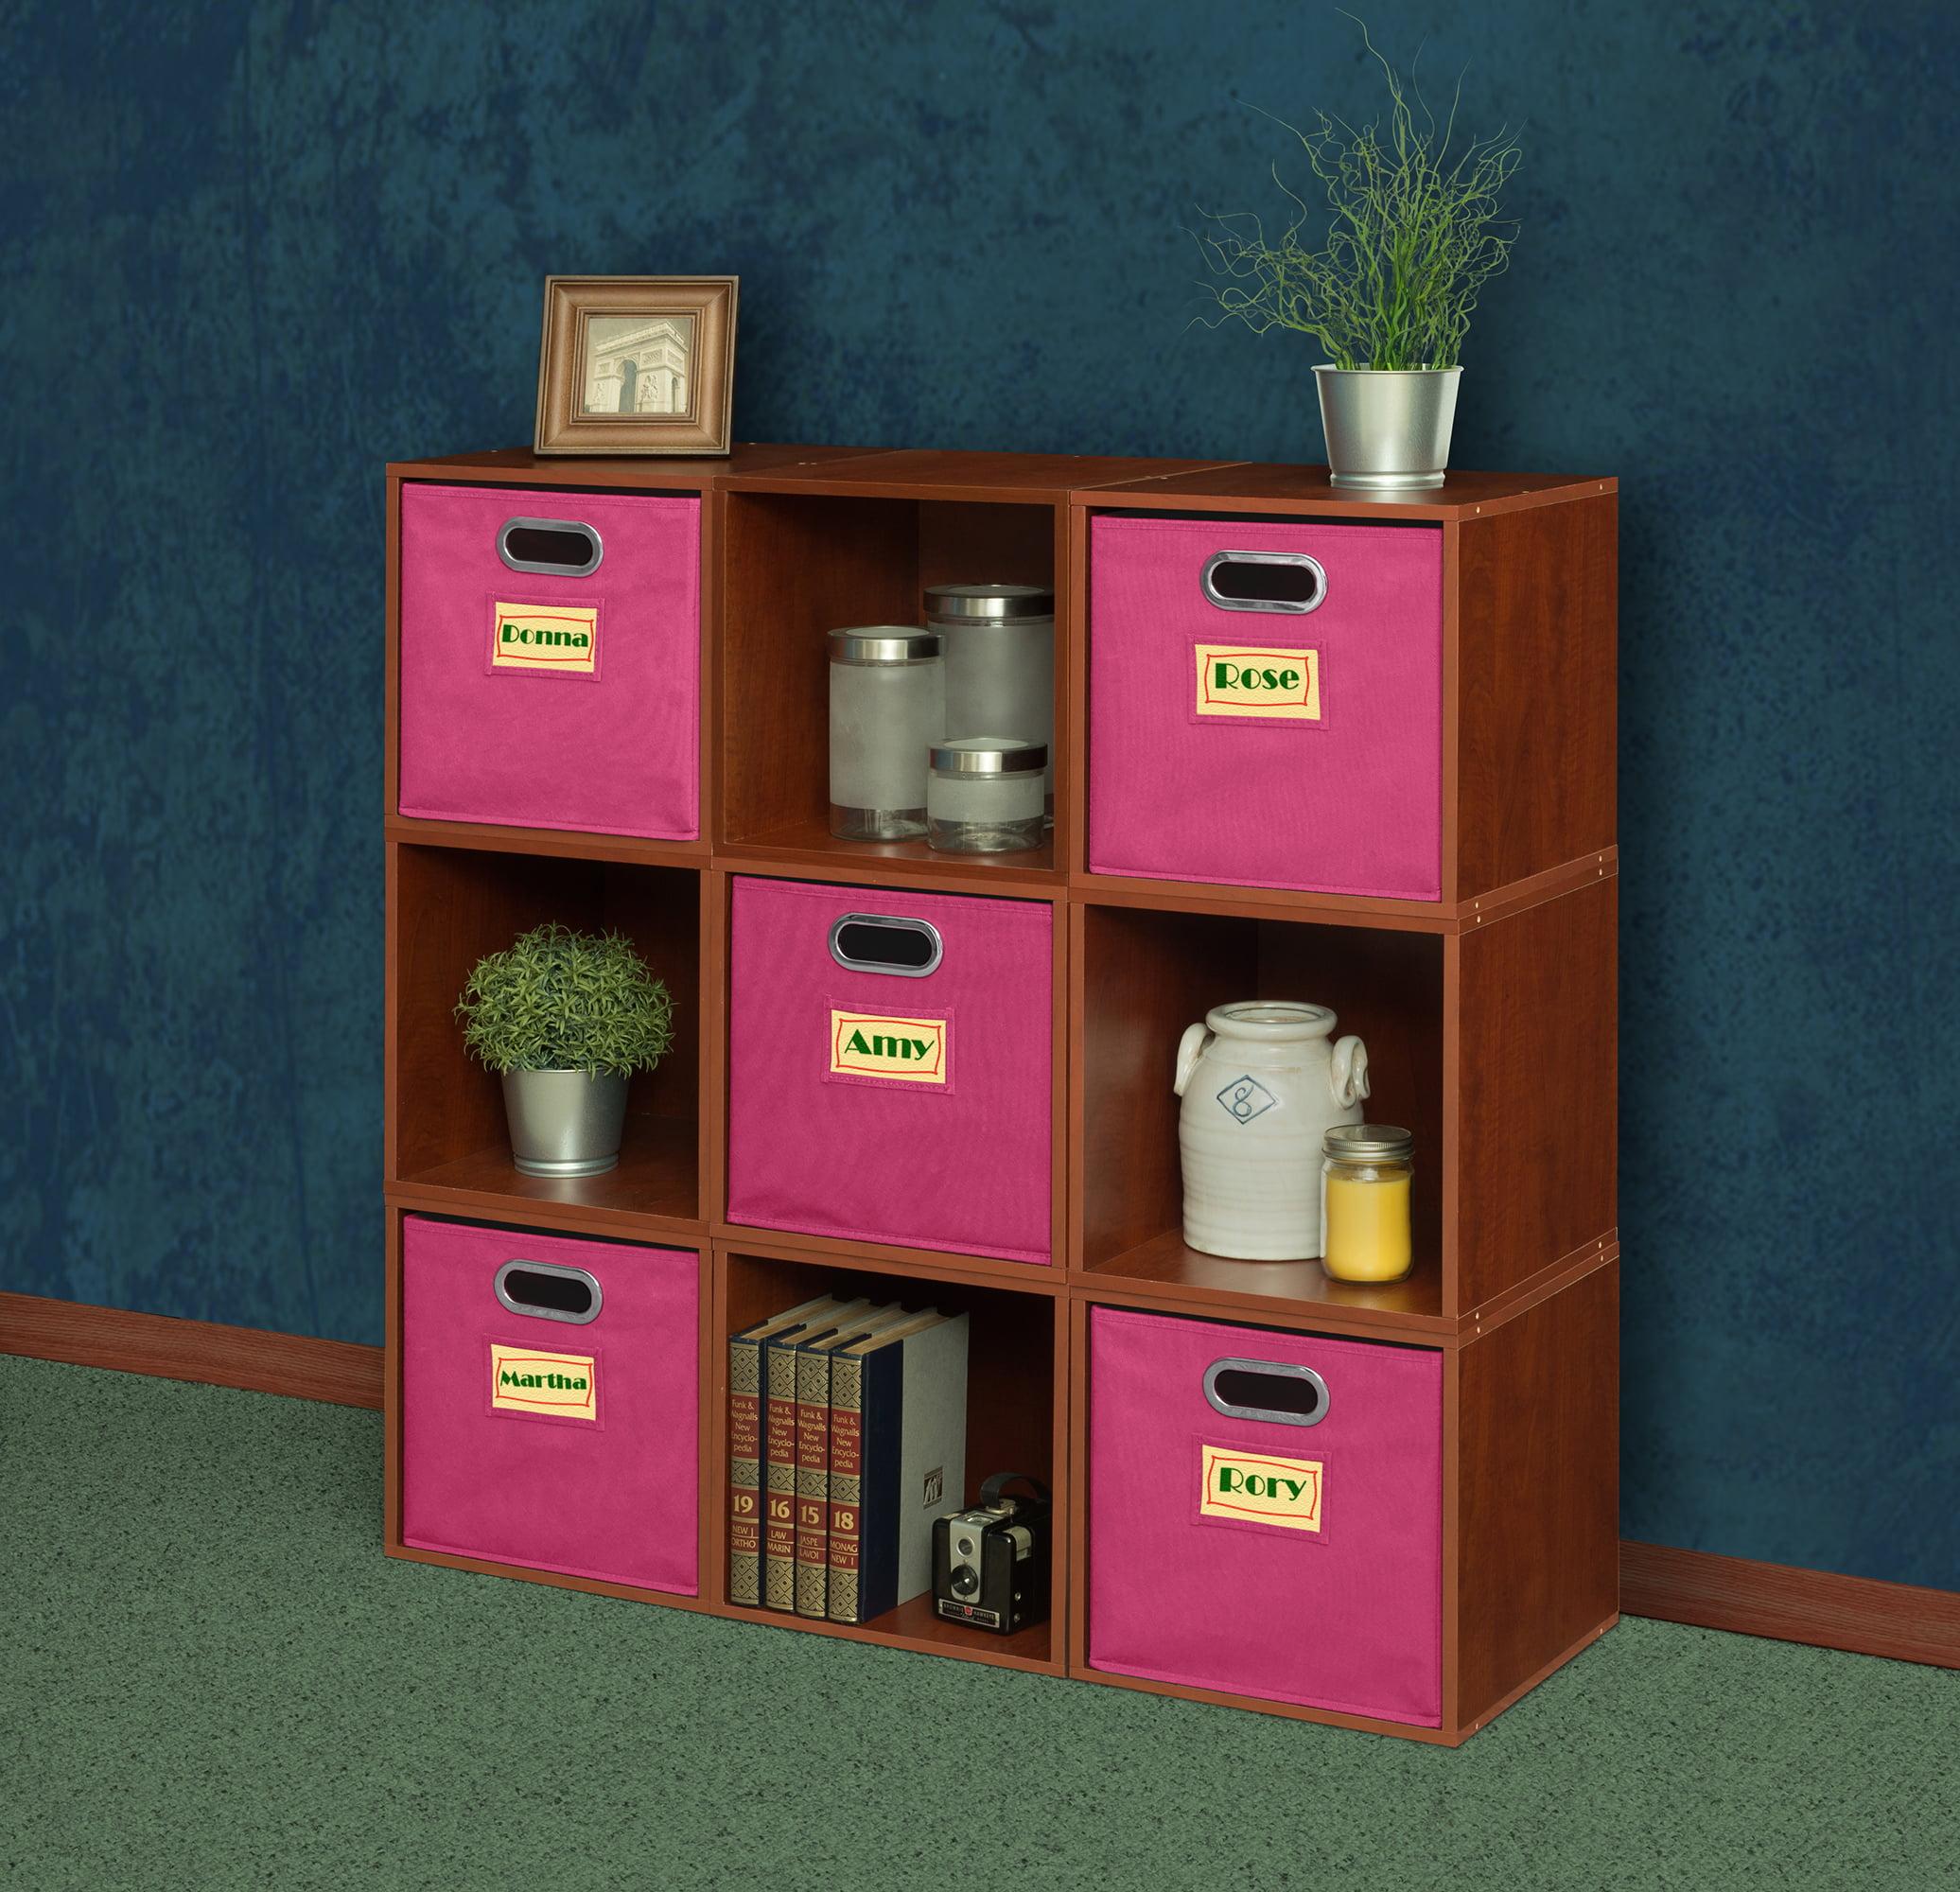 Regency Niche Cubo Storage Set, 9 Cubes and 5 Canvas Bins- Cherry/Pink